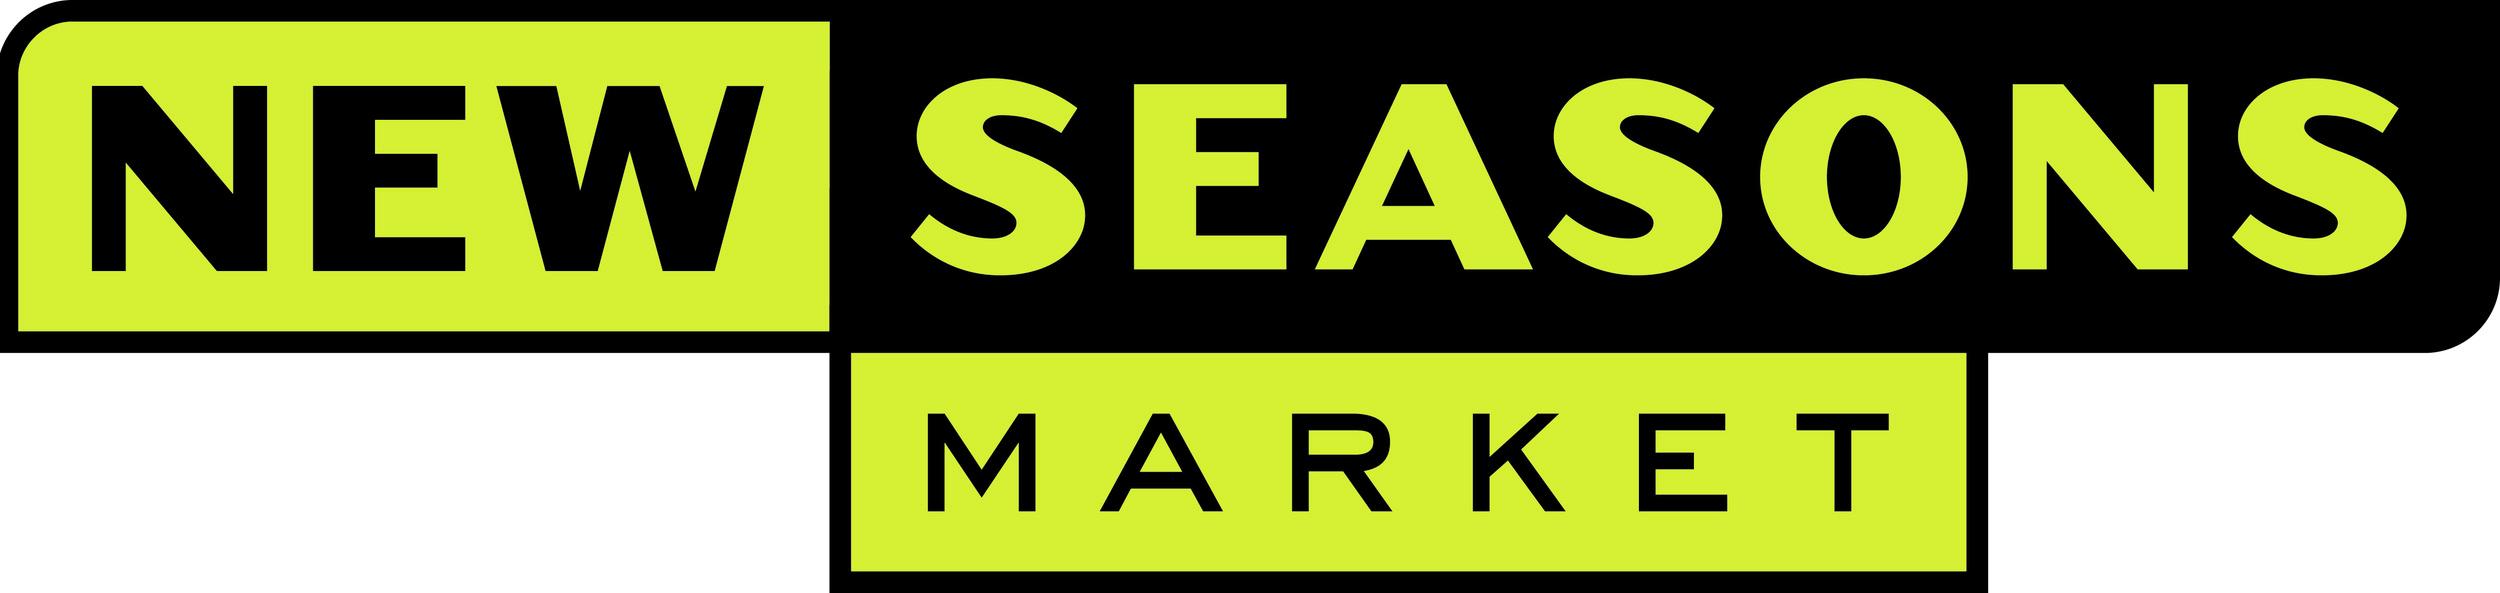 New_Seasons_Market.jpg